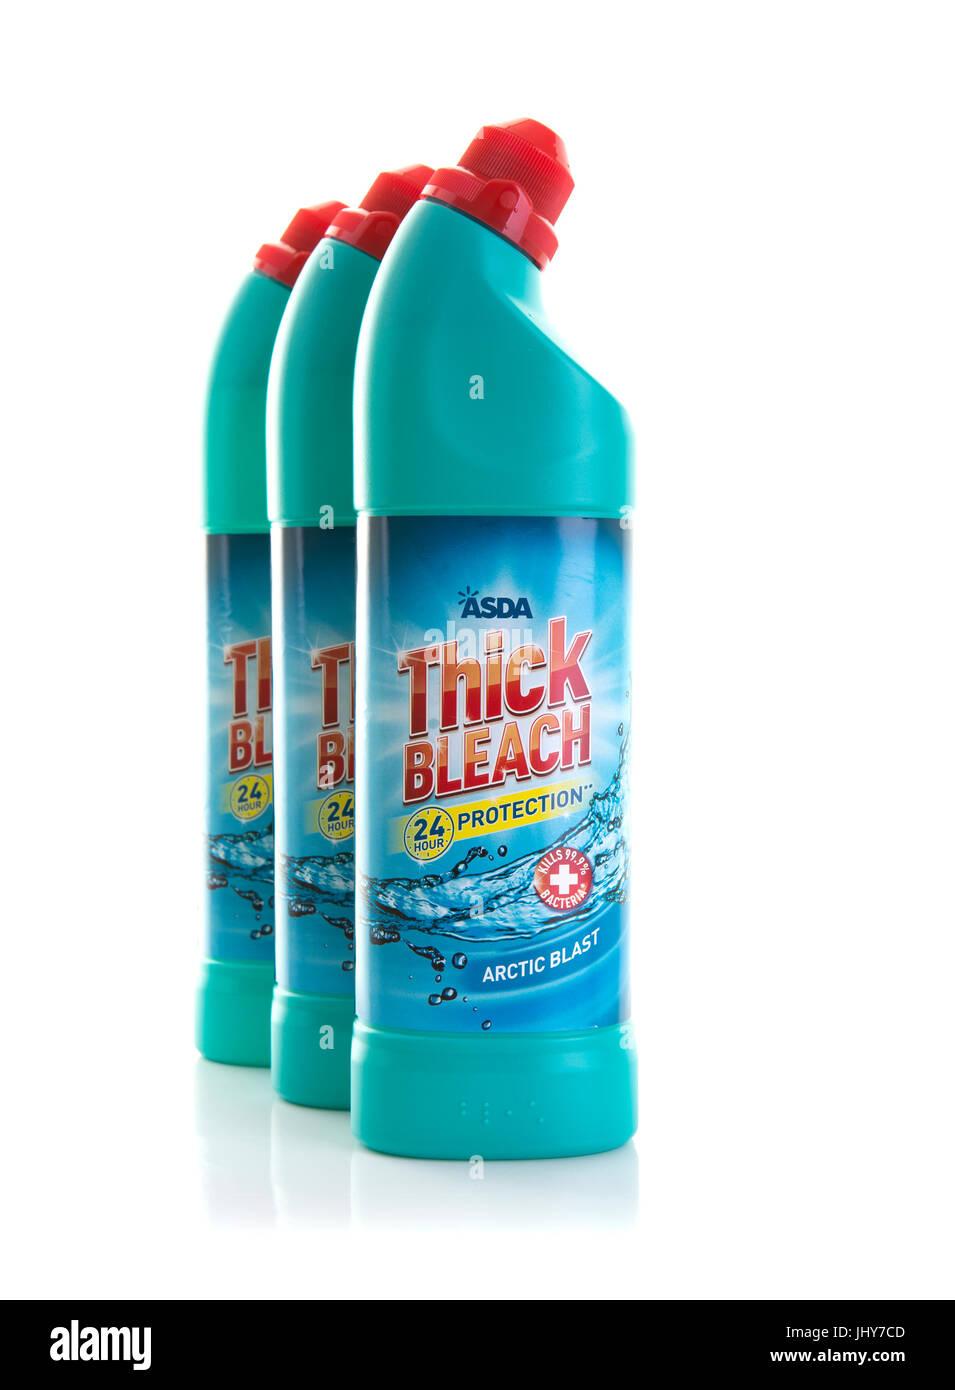 SWINDON, UK - JULY 16, 2017: Three Bottles of ASDA Thick Arctic Blast Bleach on a White background - Stock Image